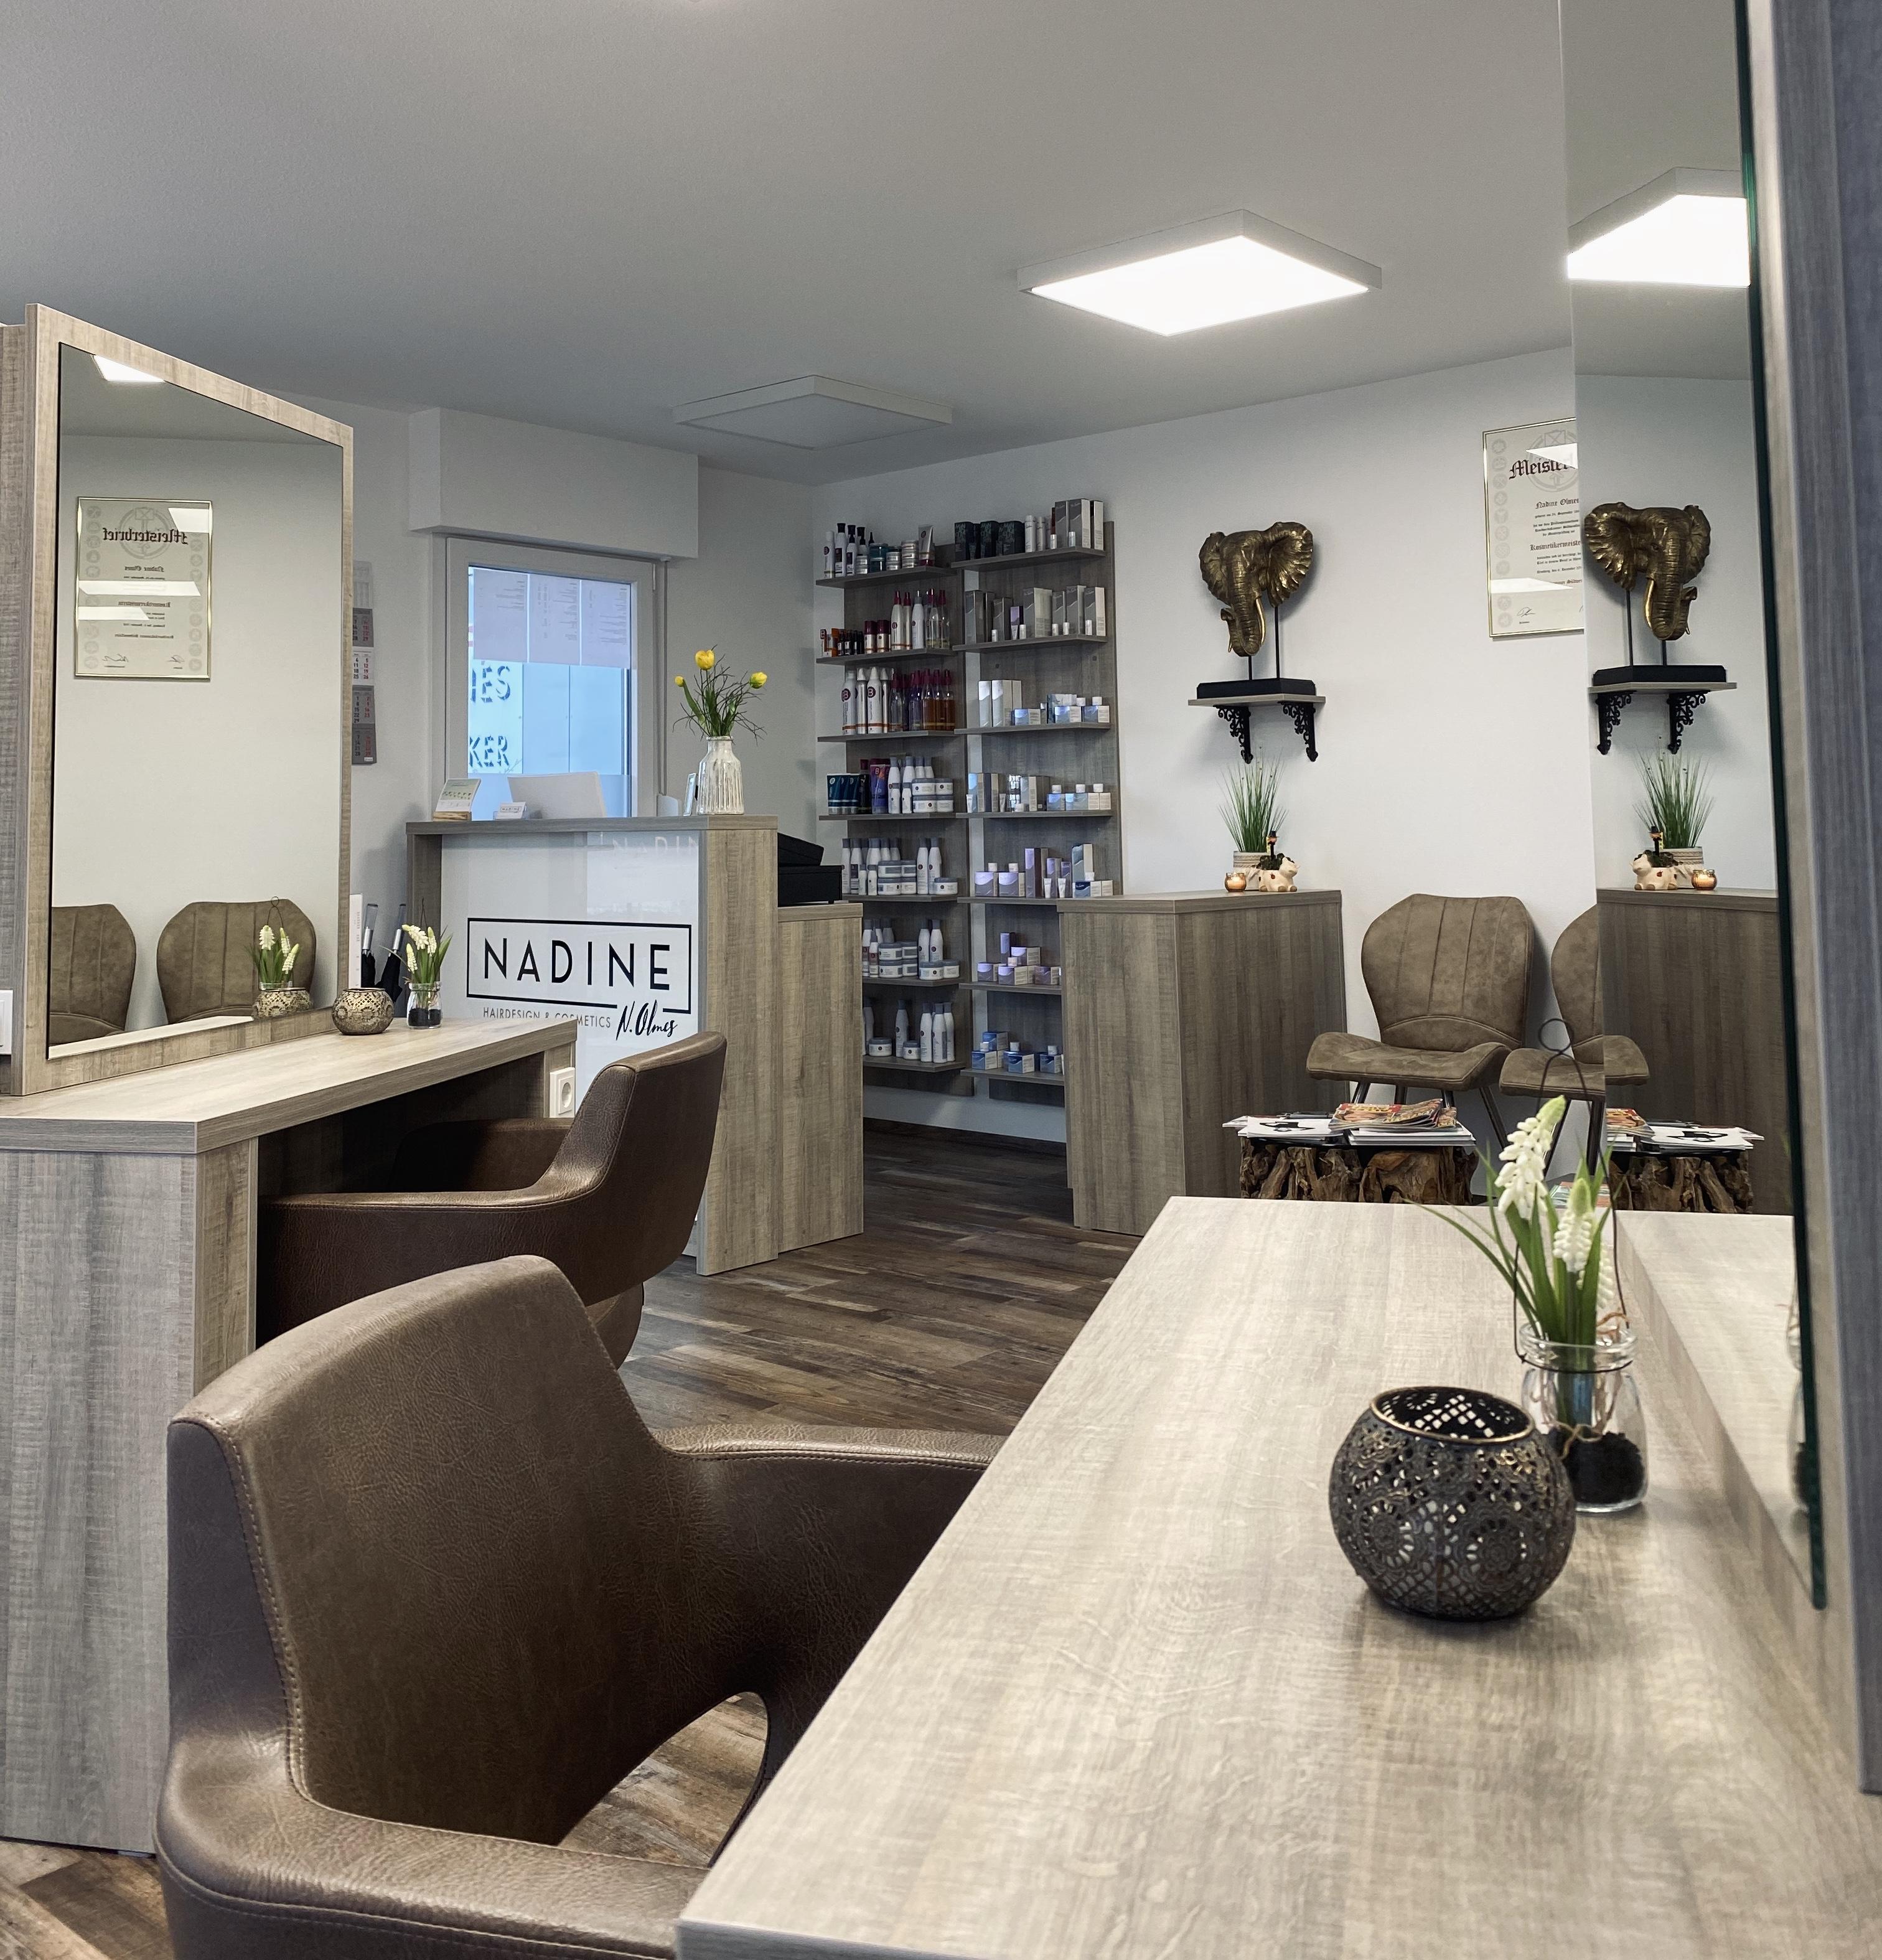 Nadine - Hairdesign & Cosmetics Ense